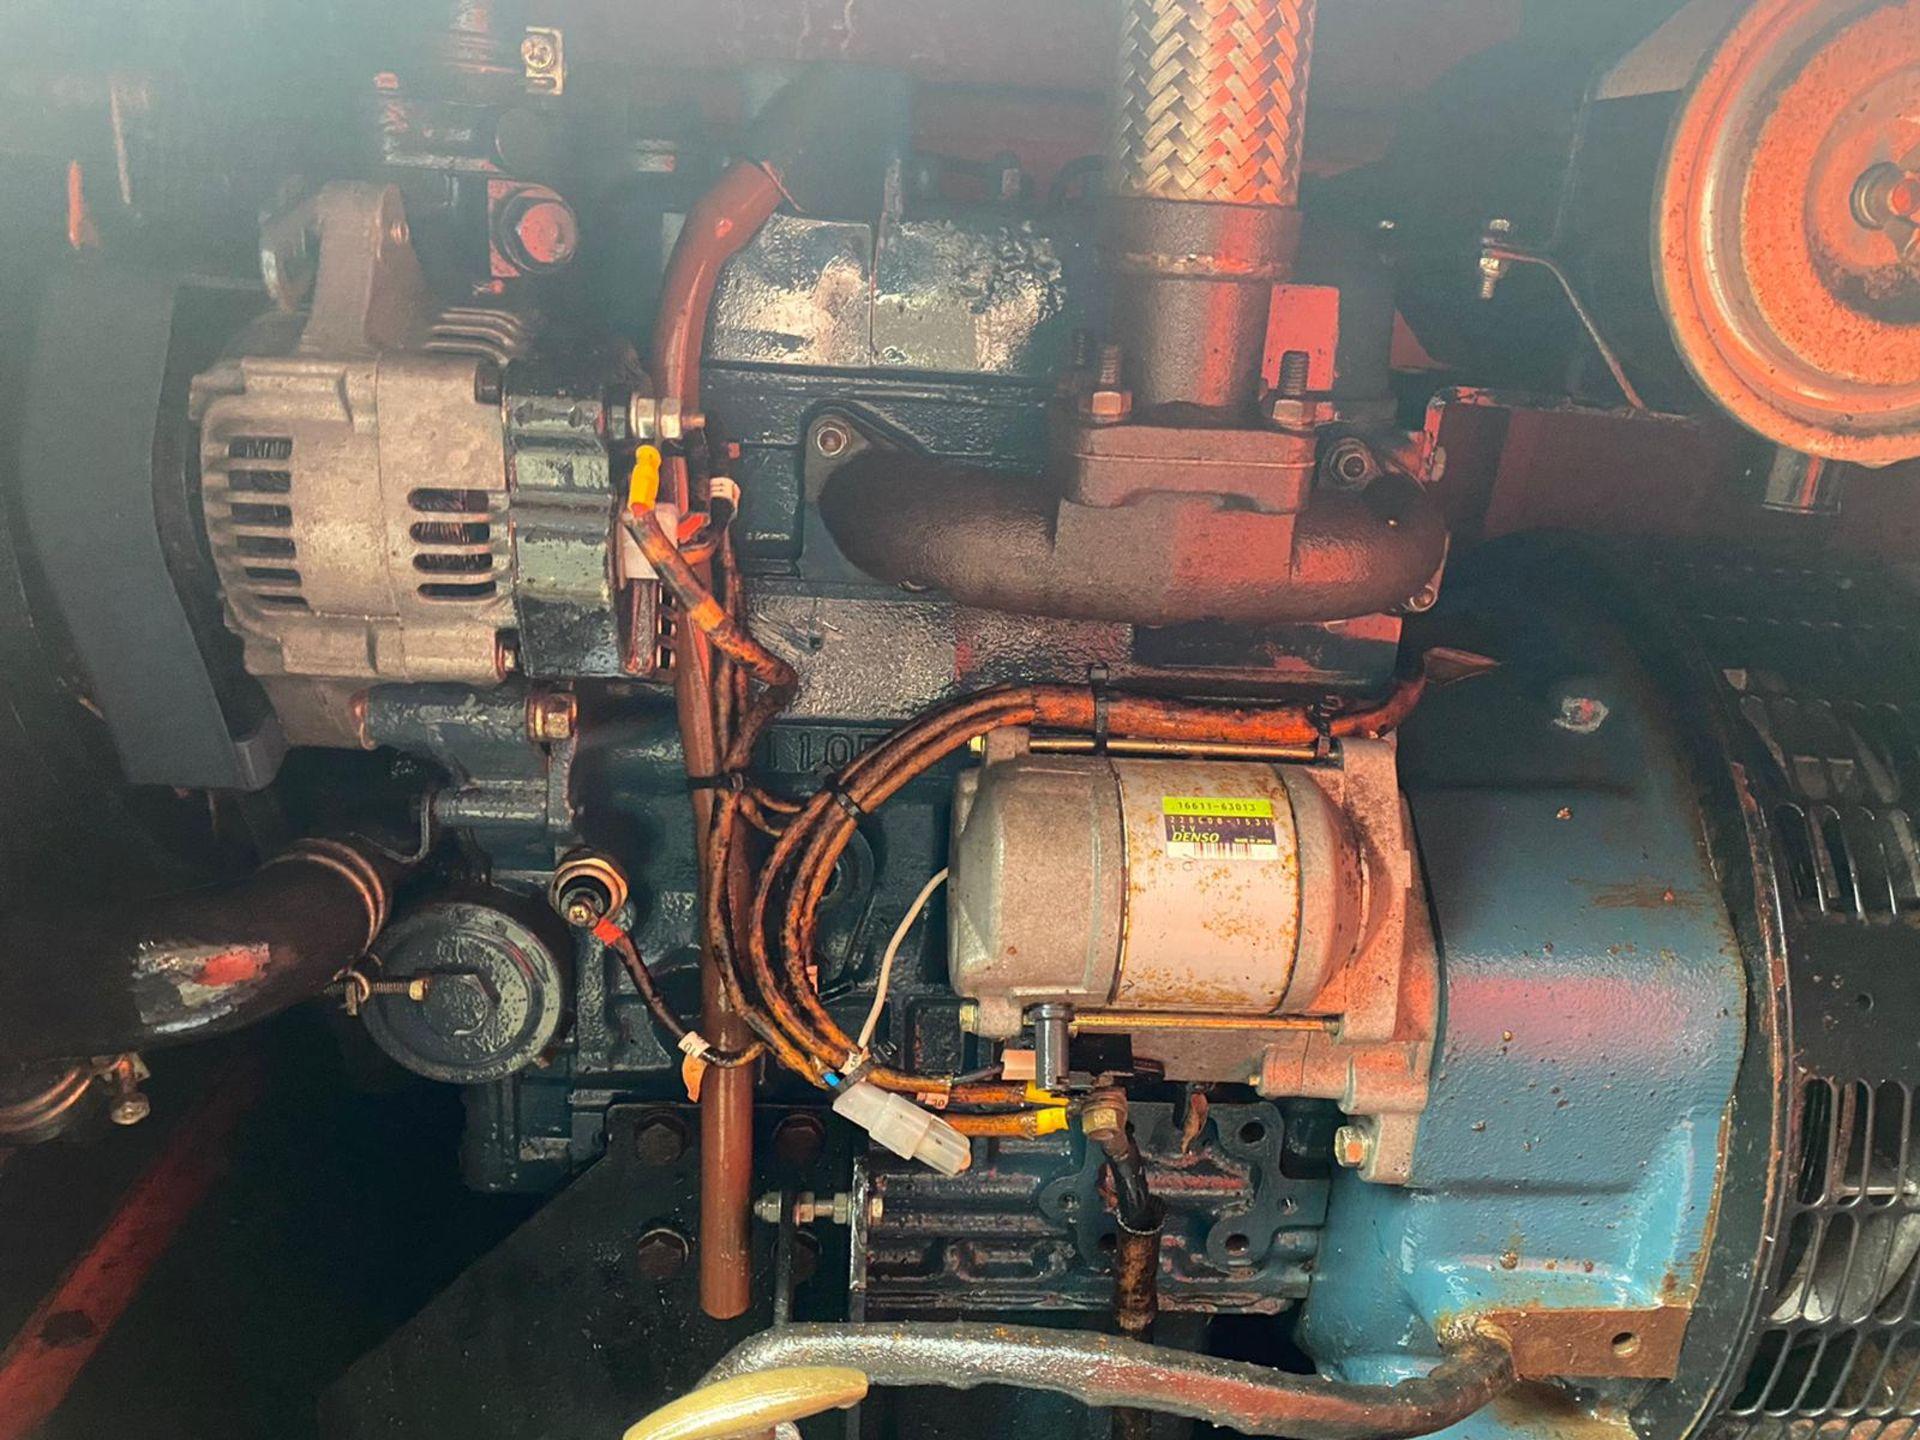 VT1 TOWER LIGHT, TOWABLE LIGHTING TOWER, KUBOTA D1105 ENGINE - SOLD AS SEEN *PLUS VAT* - Image 3 of 4